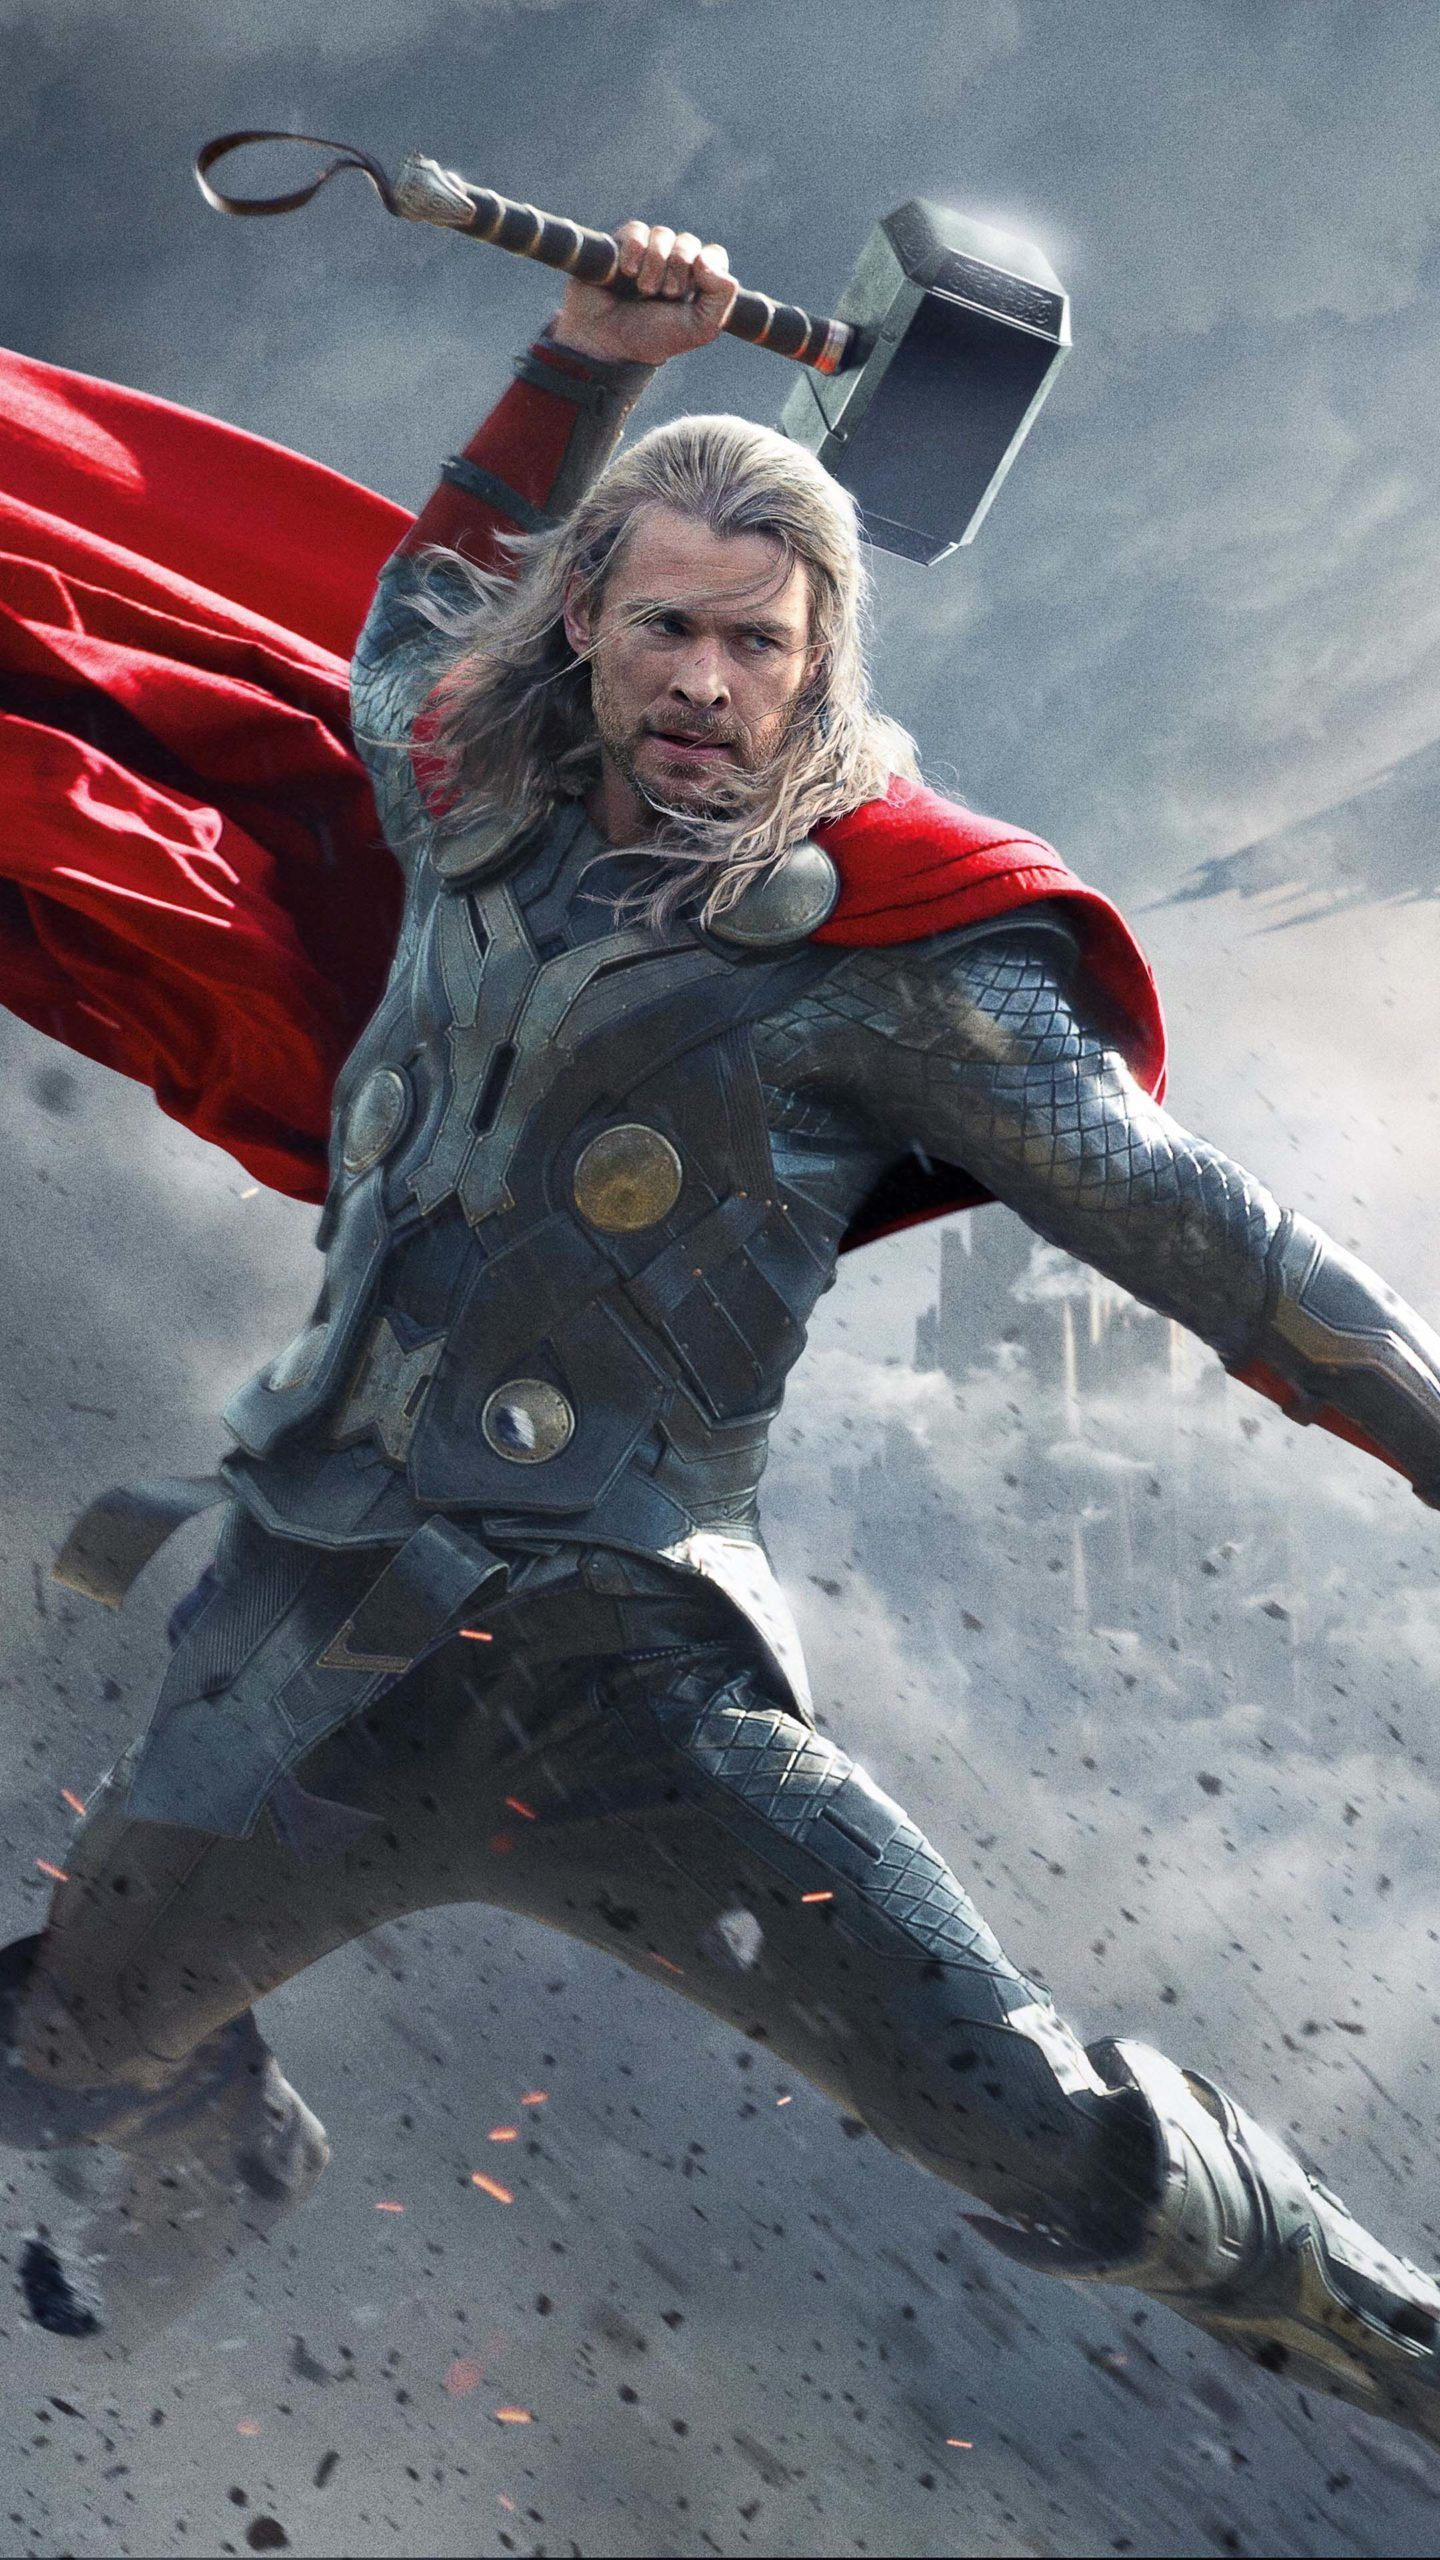 Thor Superhero Chris Hemsworth 4K Ultra HD Mobile